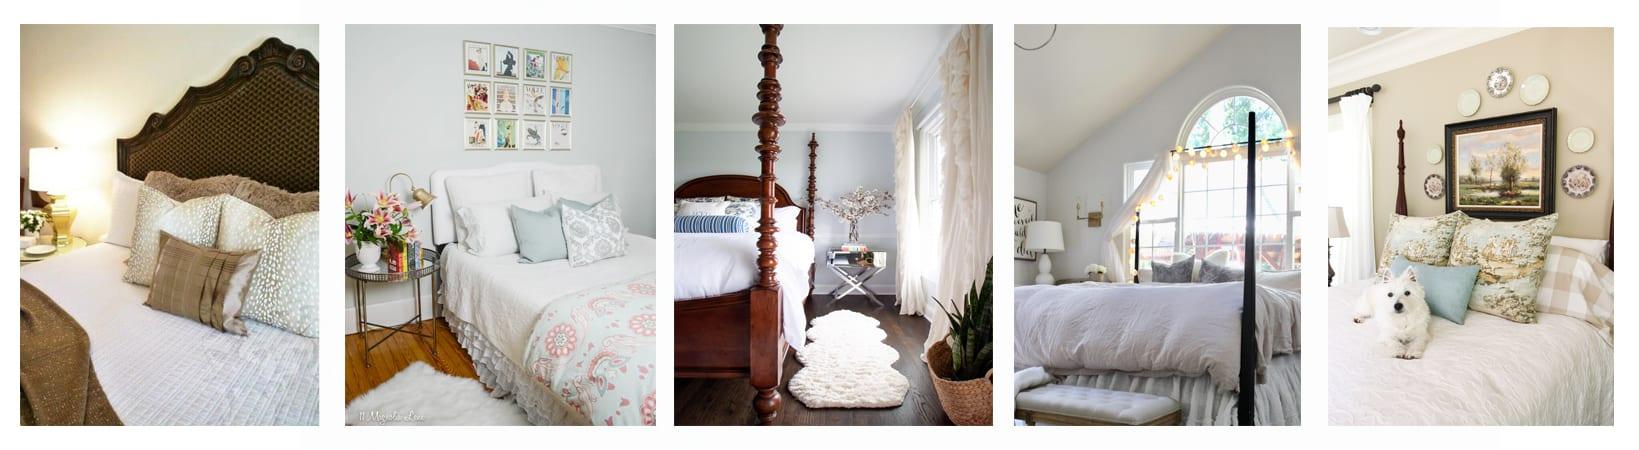 Wednesday beautiful bedrooms tour